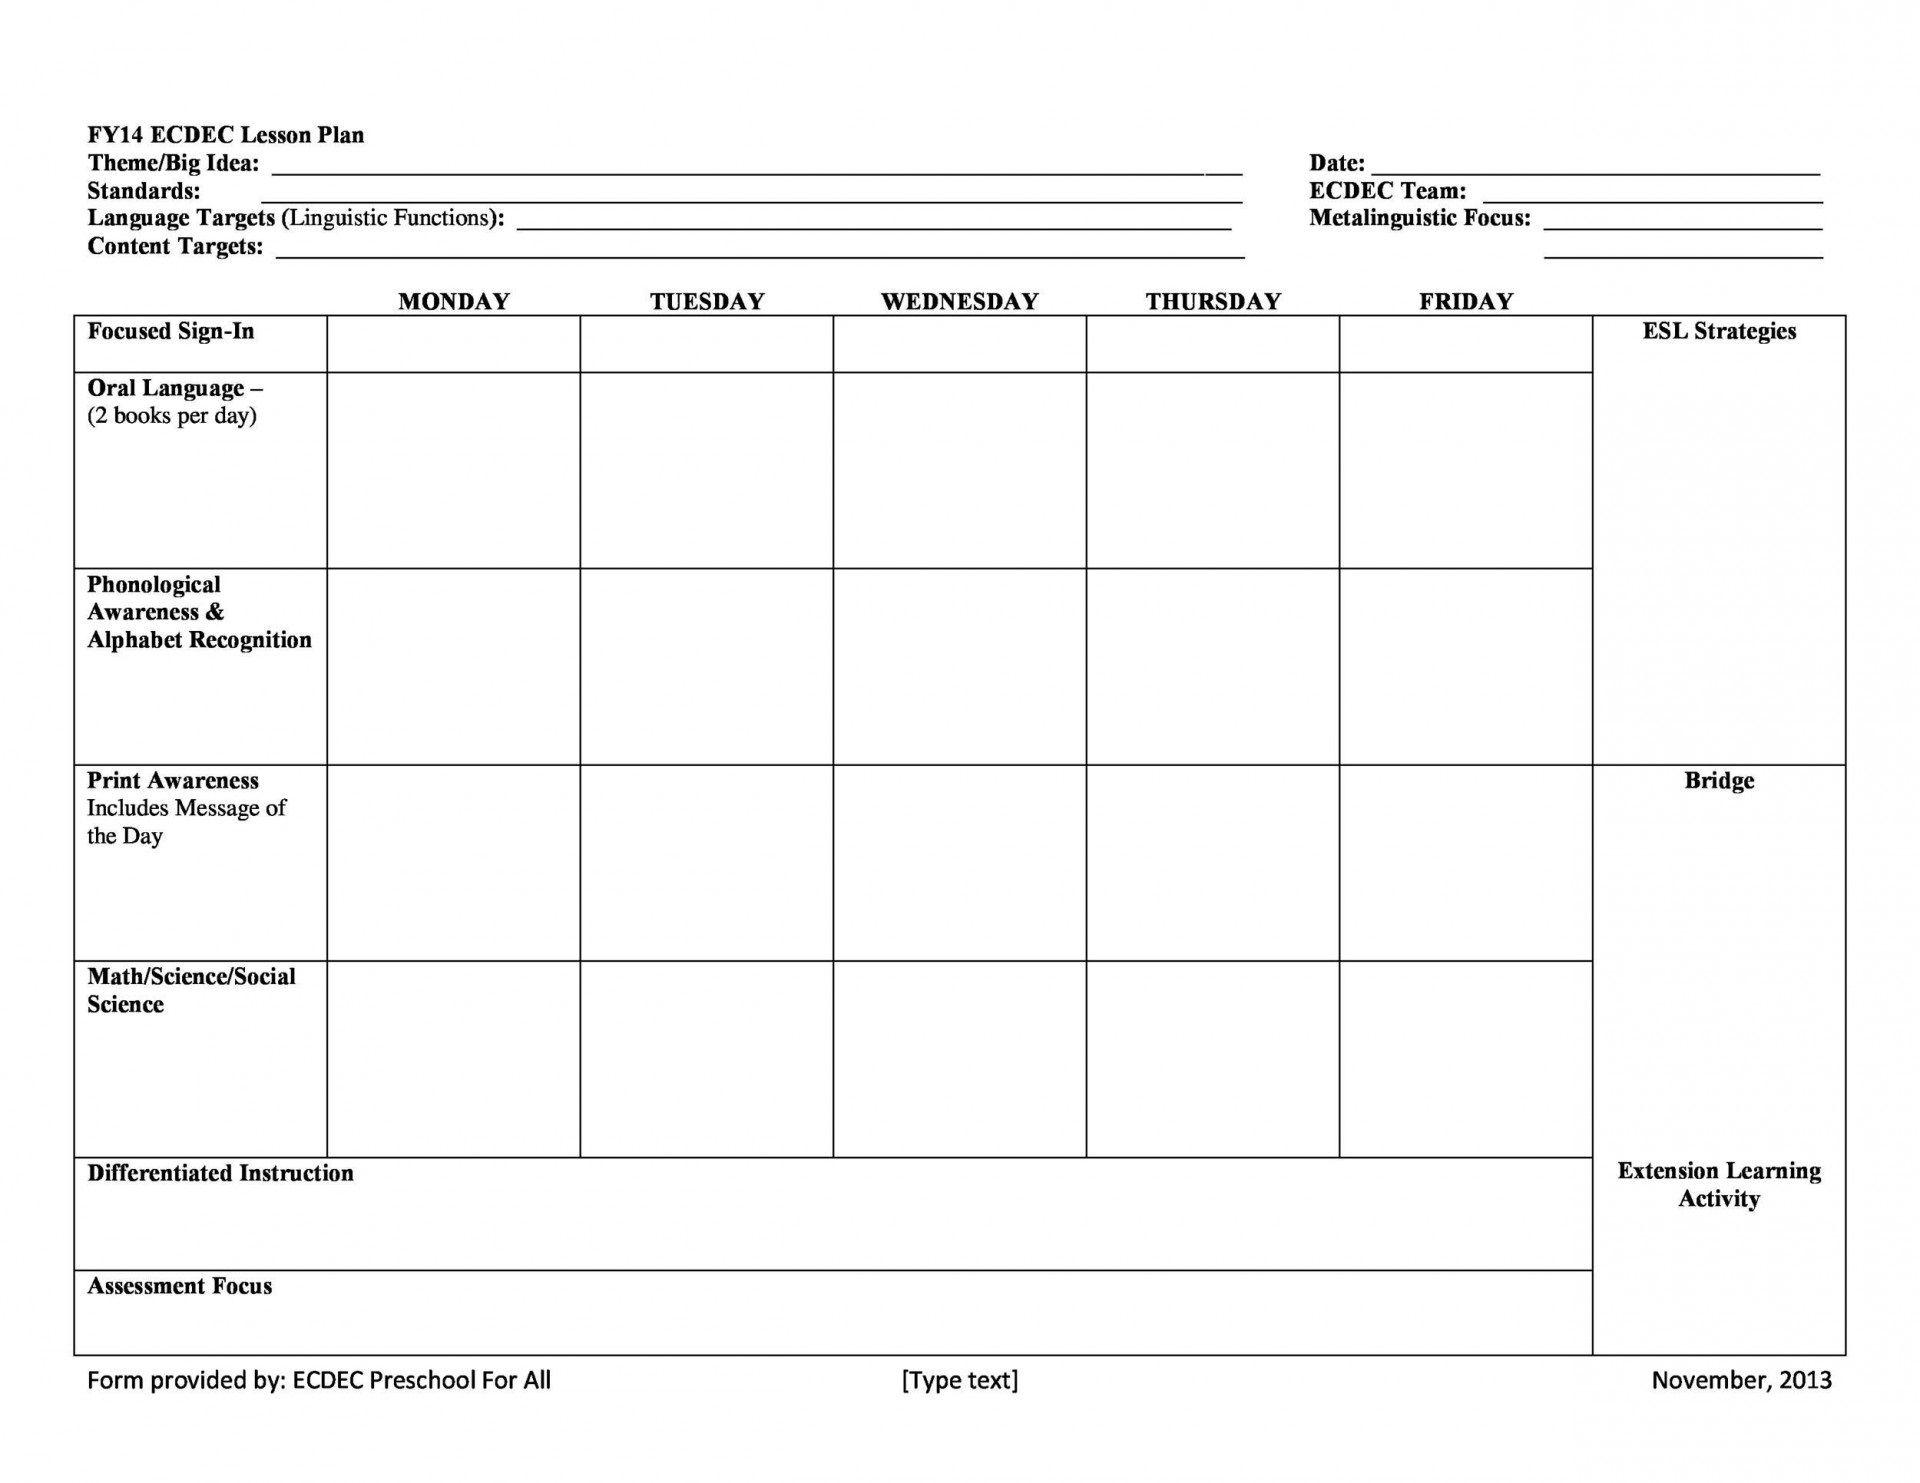 000 Stunning Free Printable Preschool Weekly Lesson Plan Template High Definition  KindergartenFull